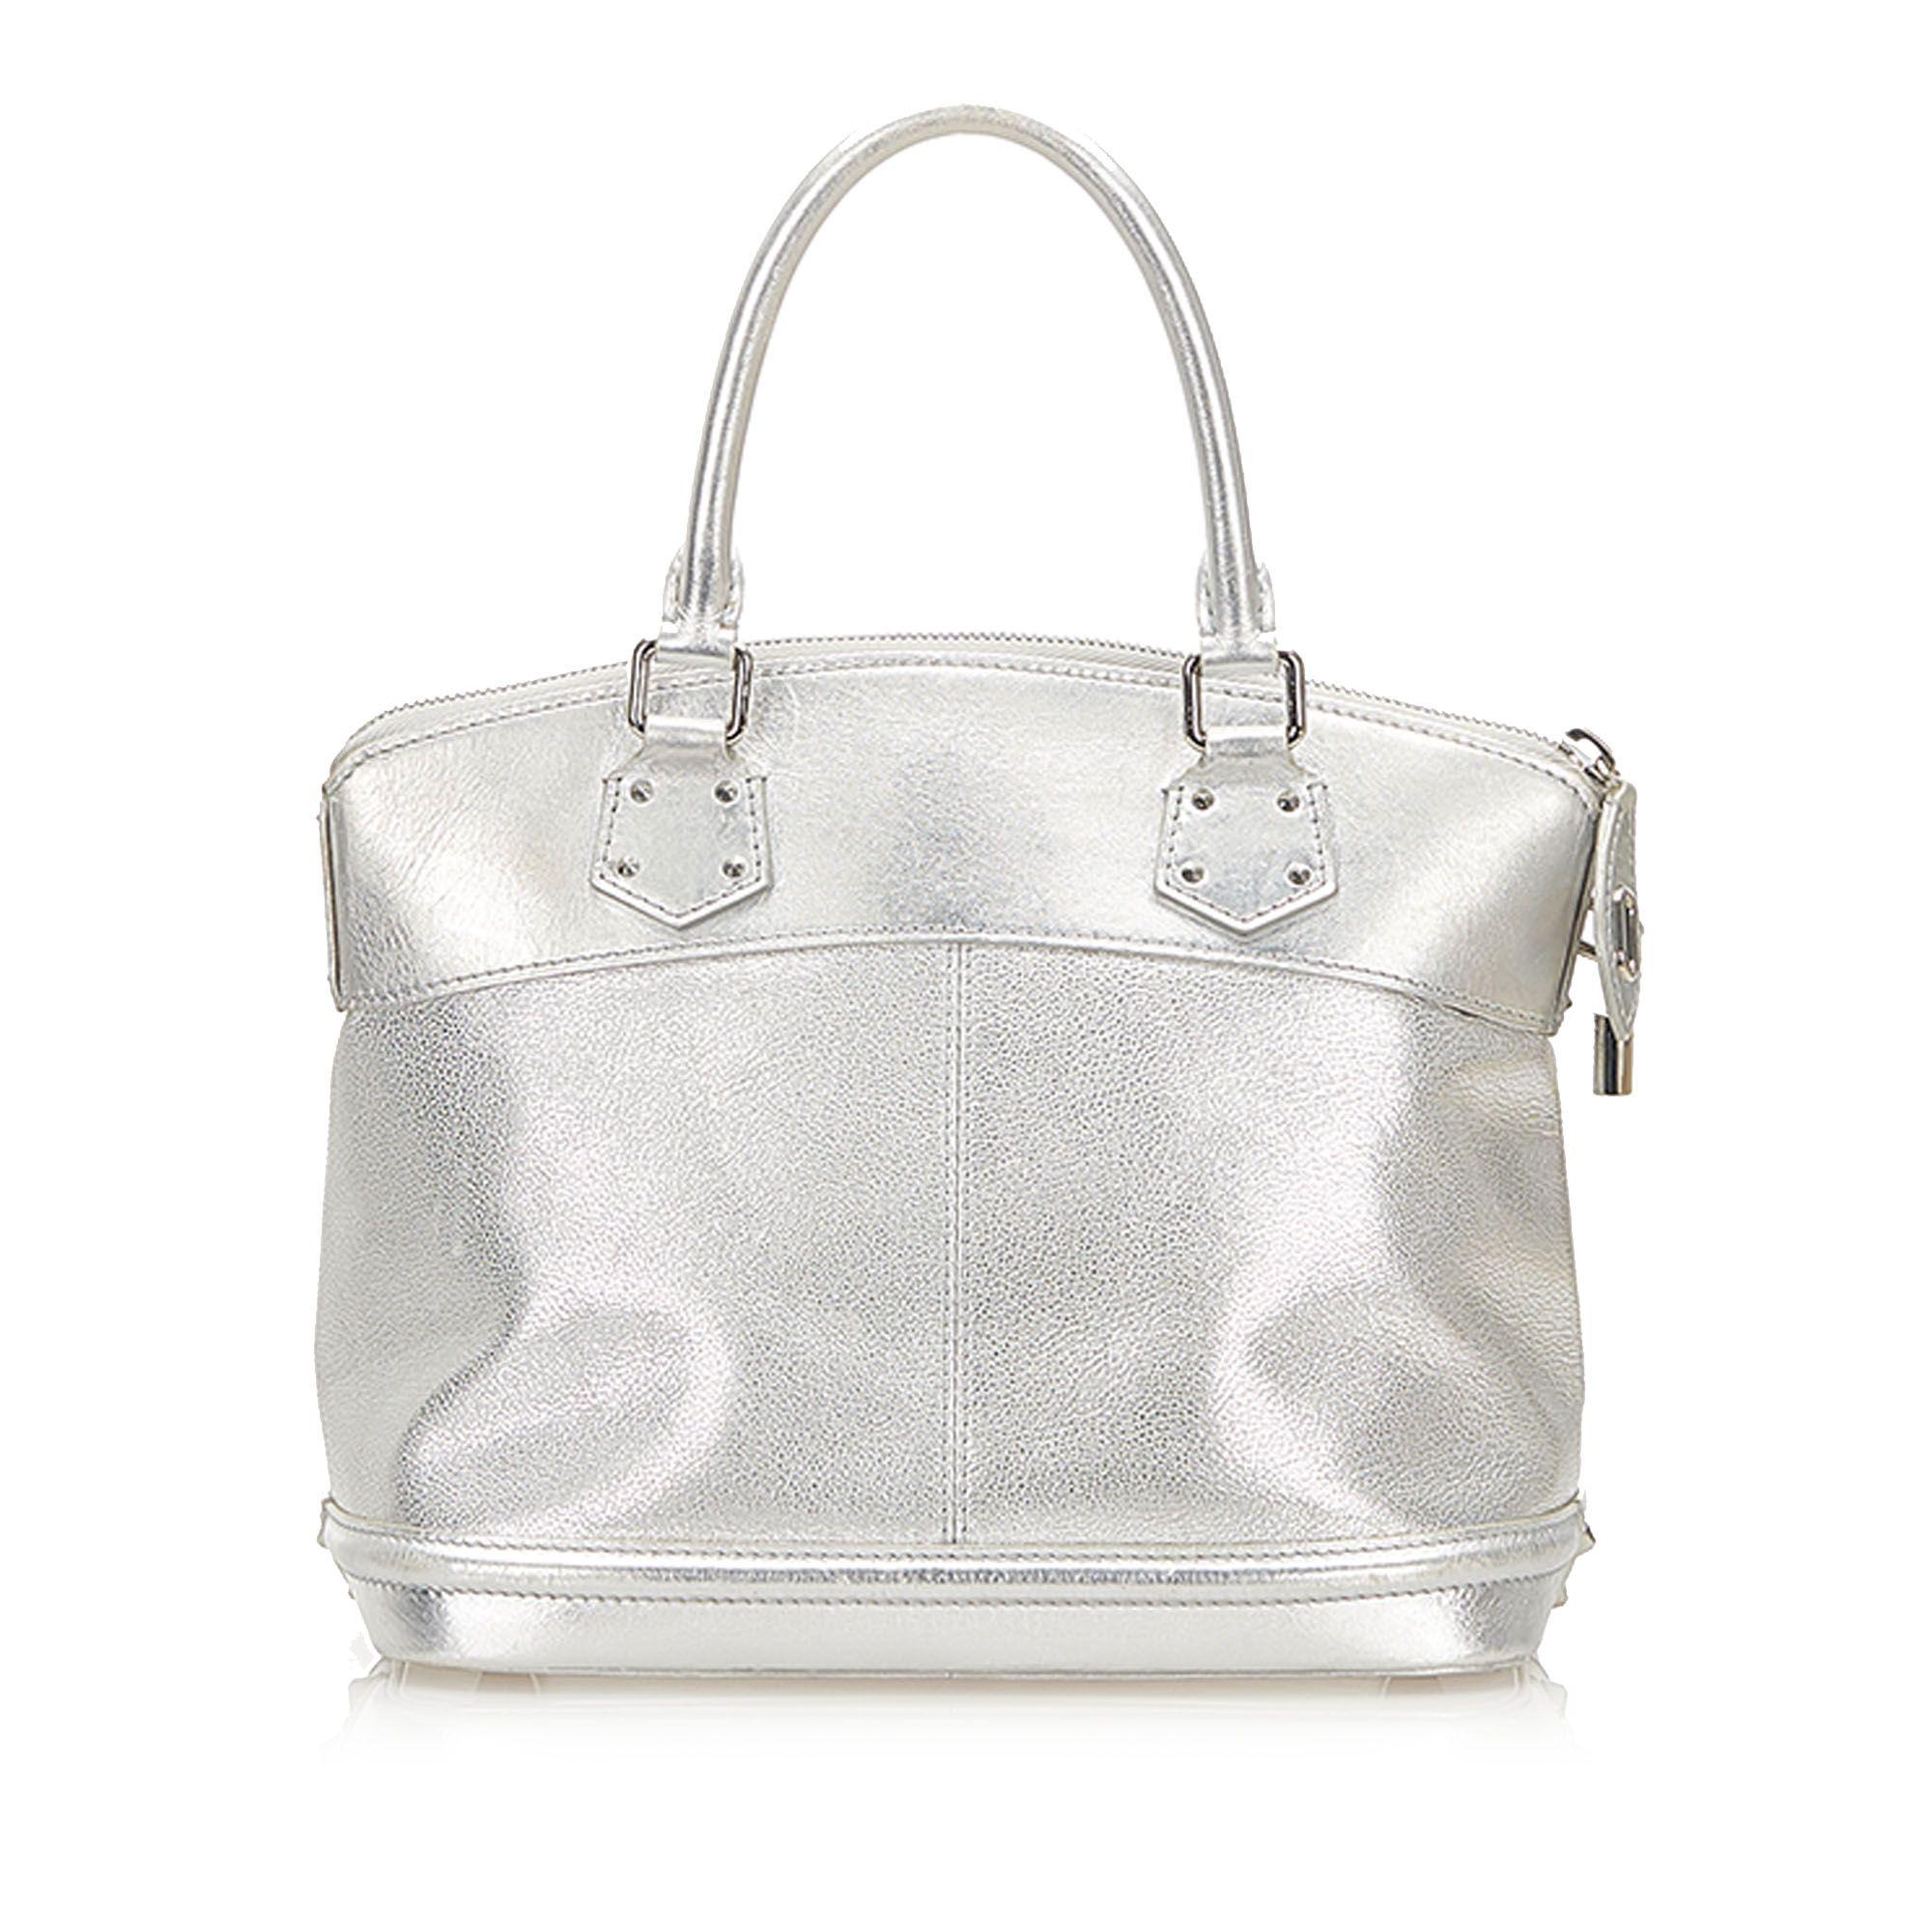 Vintage Louis Vuitton Suhali Lockit PM Silver